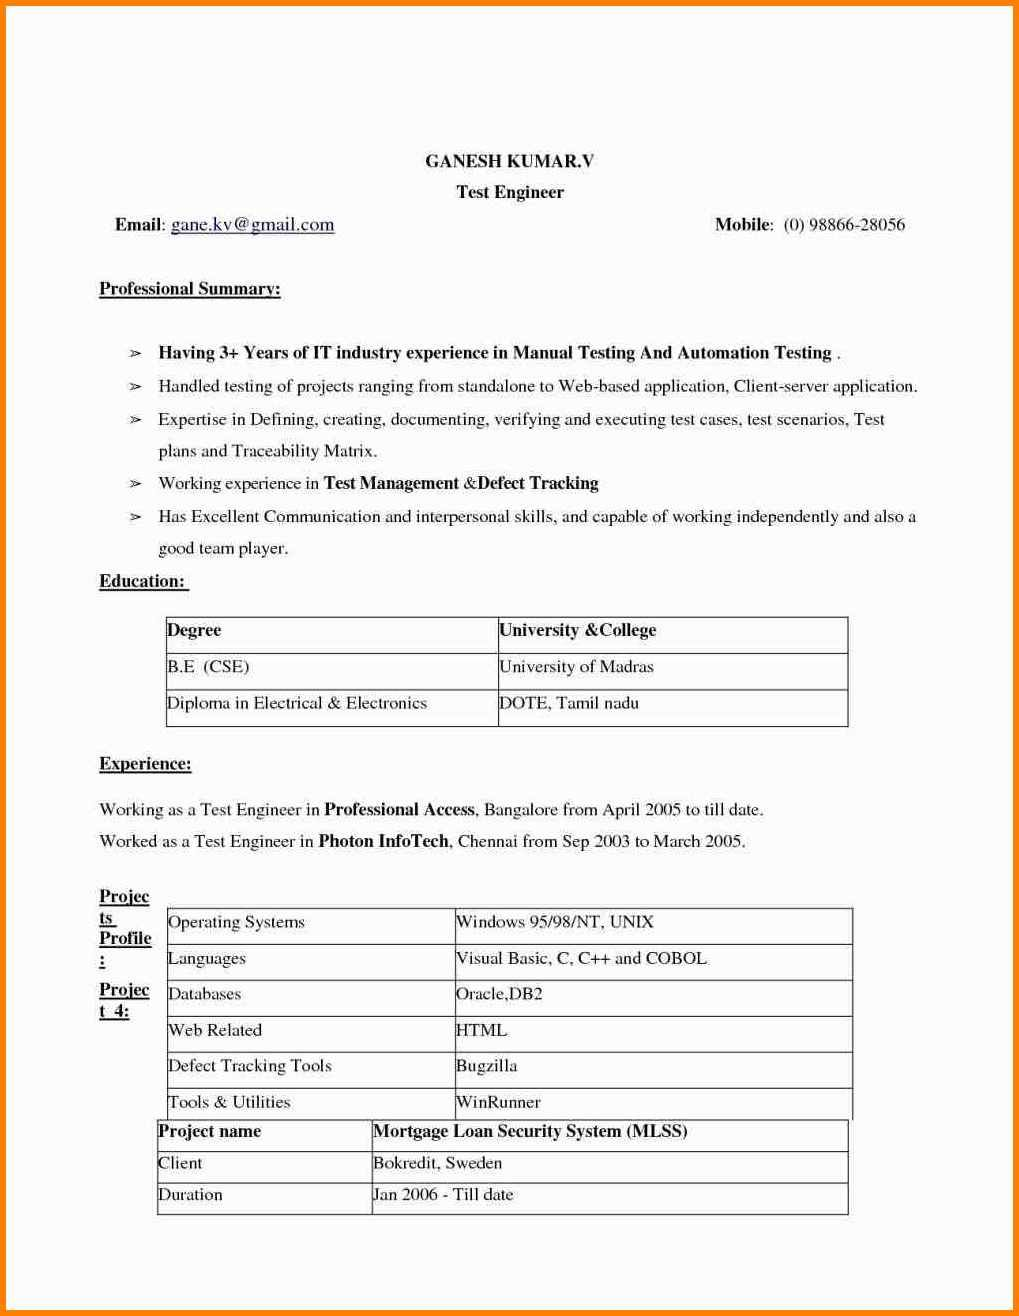 Biodata Model Download Biodata Format Download For Marriage Biodata Format Download Free Bio Bio Data For Marriage Biodata Format Download Resume Template Word